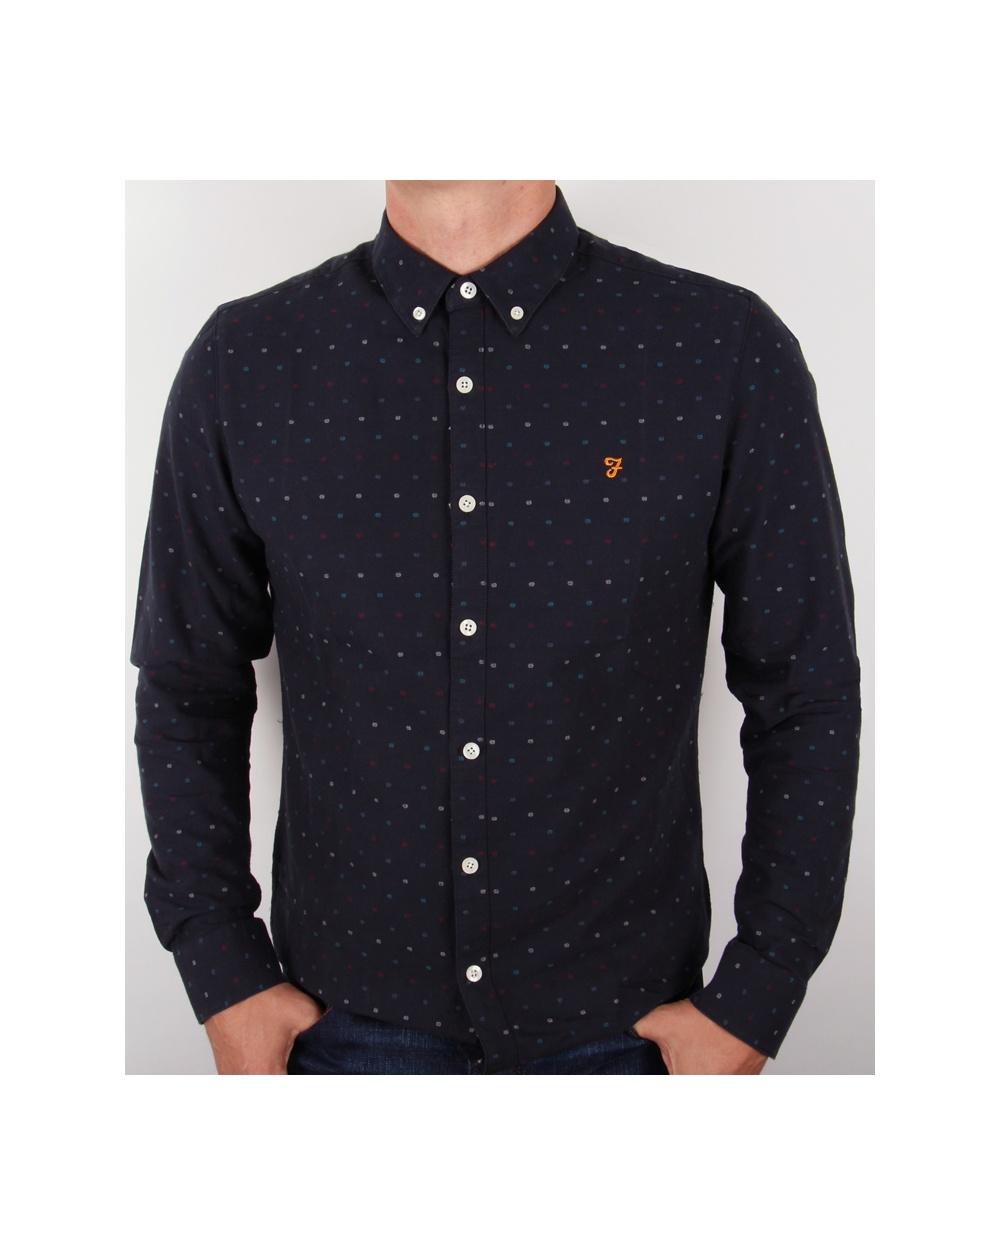 Farah garfield slim fit shirt navy blue long sleeve cotton for Navy slim fit shirt